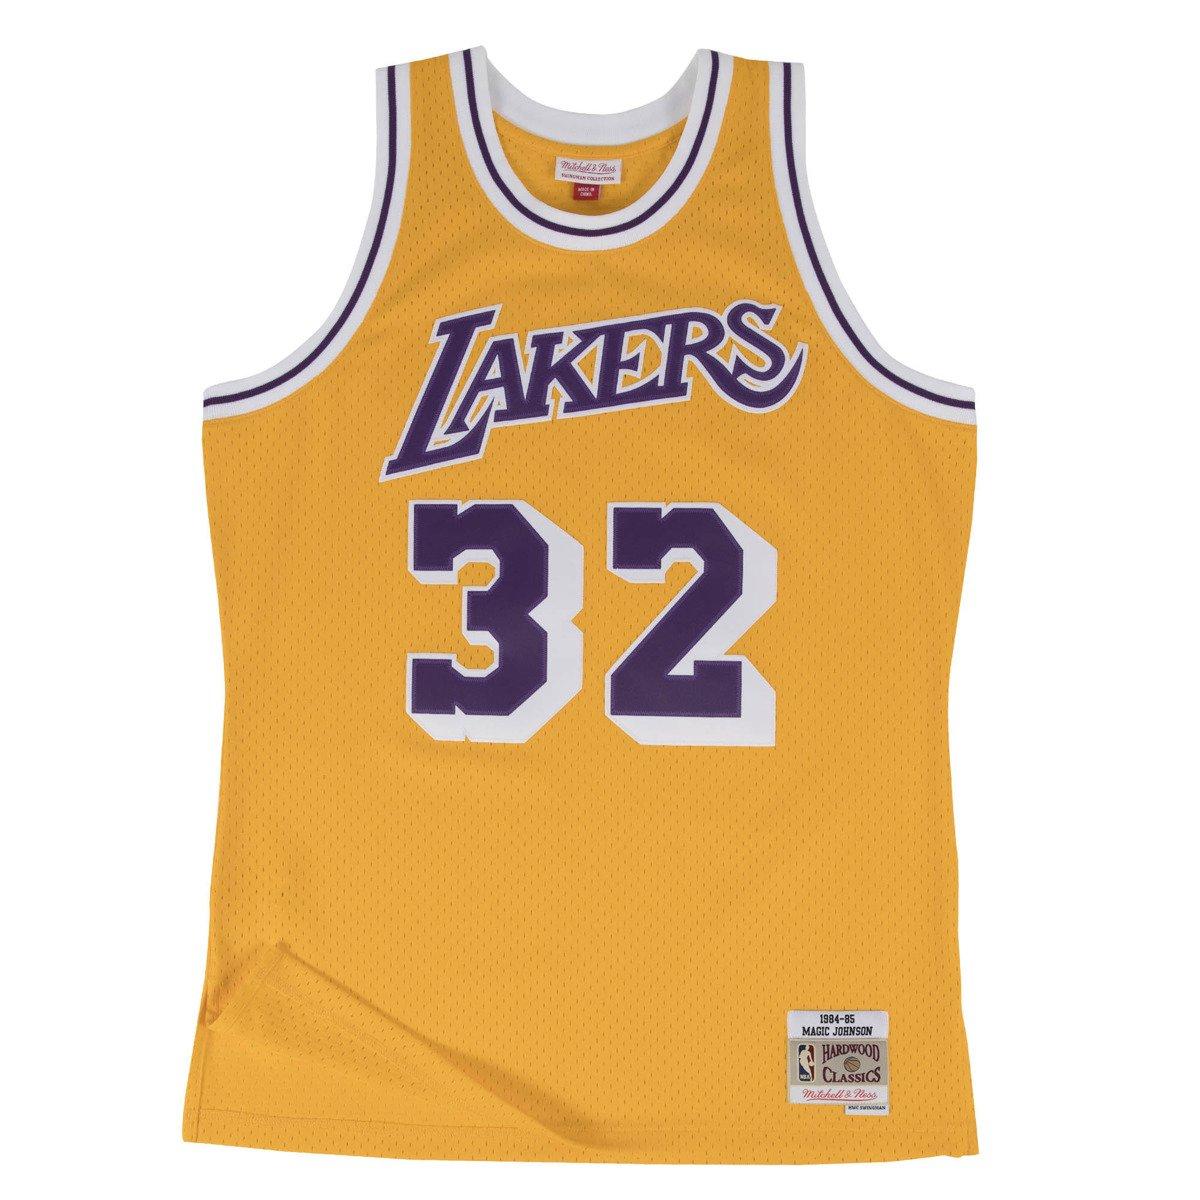 new style 82c8b 32989 Mitchell & Ness Magic Johnson 1984-85 NBA Hardwood Classics Swingman Los  Angeles Lakers Jersey